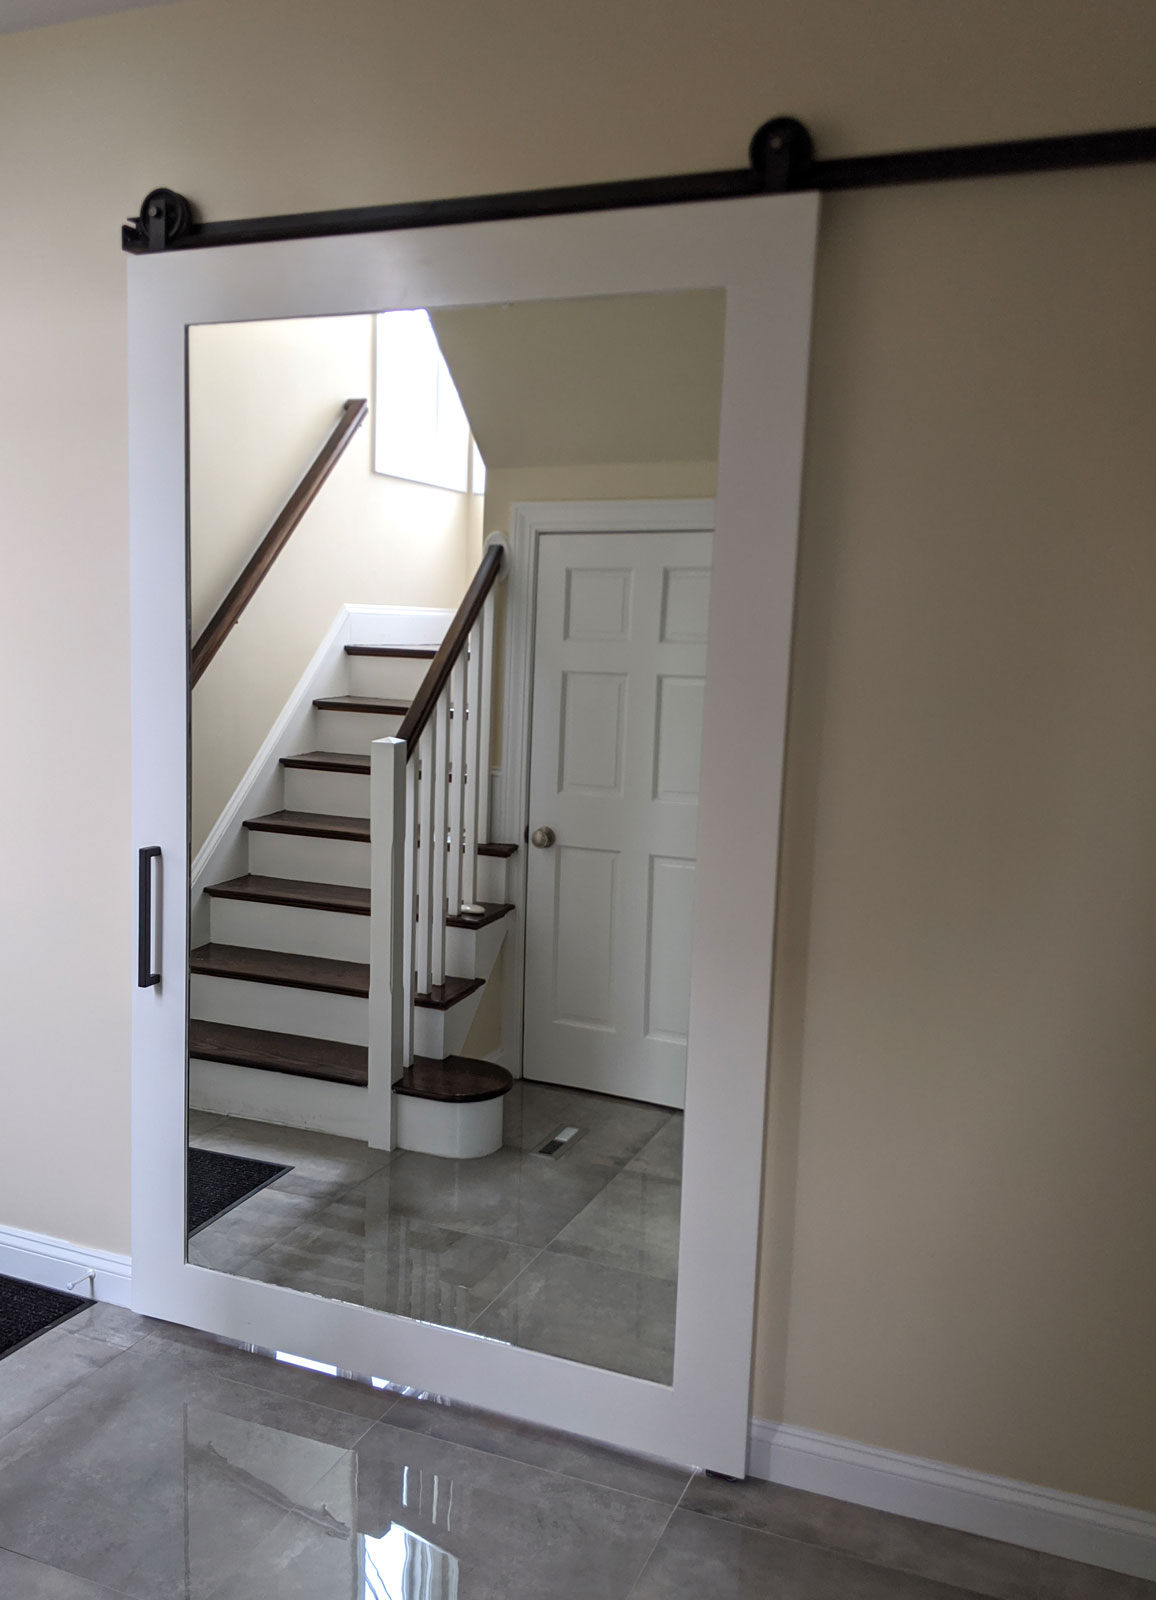 painted wood and mirror barn door